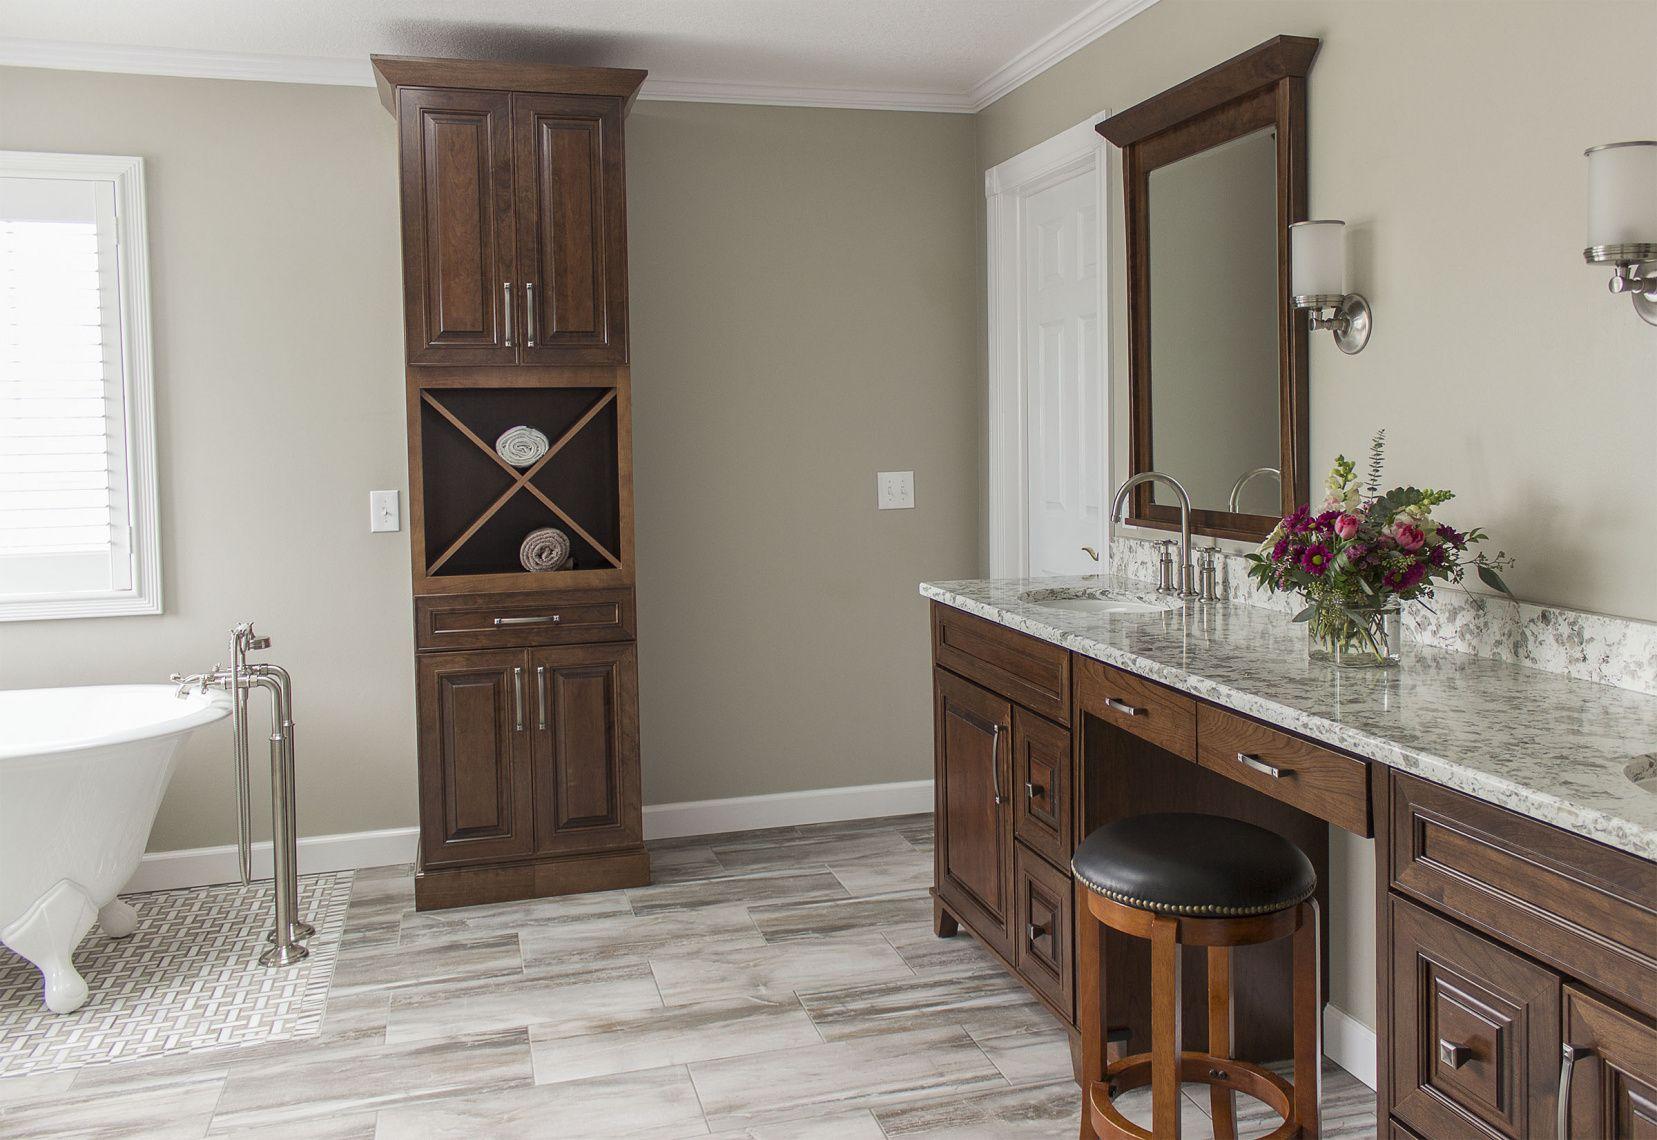 2018 Quartz Countertops toledo Ohio - Apartment Kitchen ...